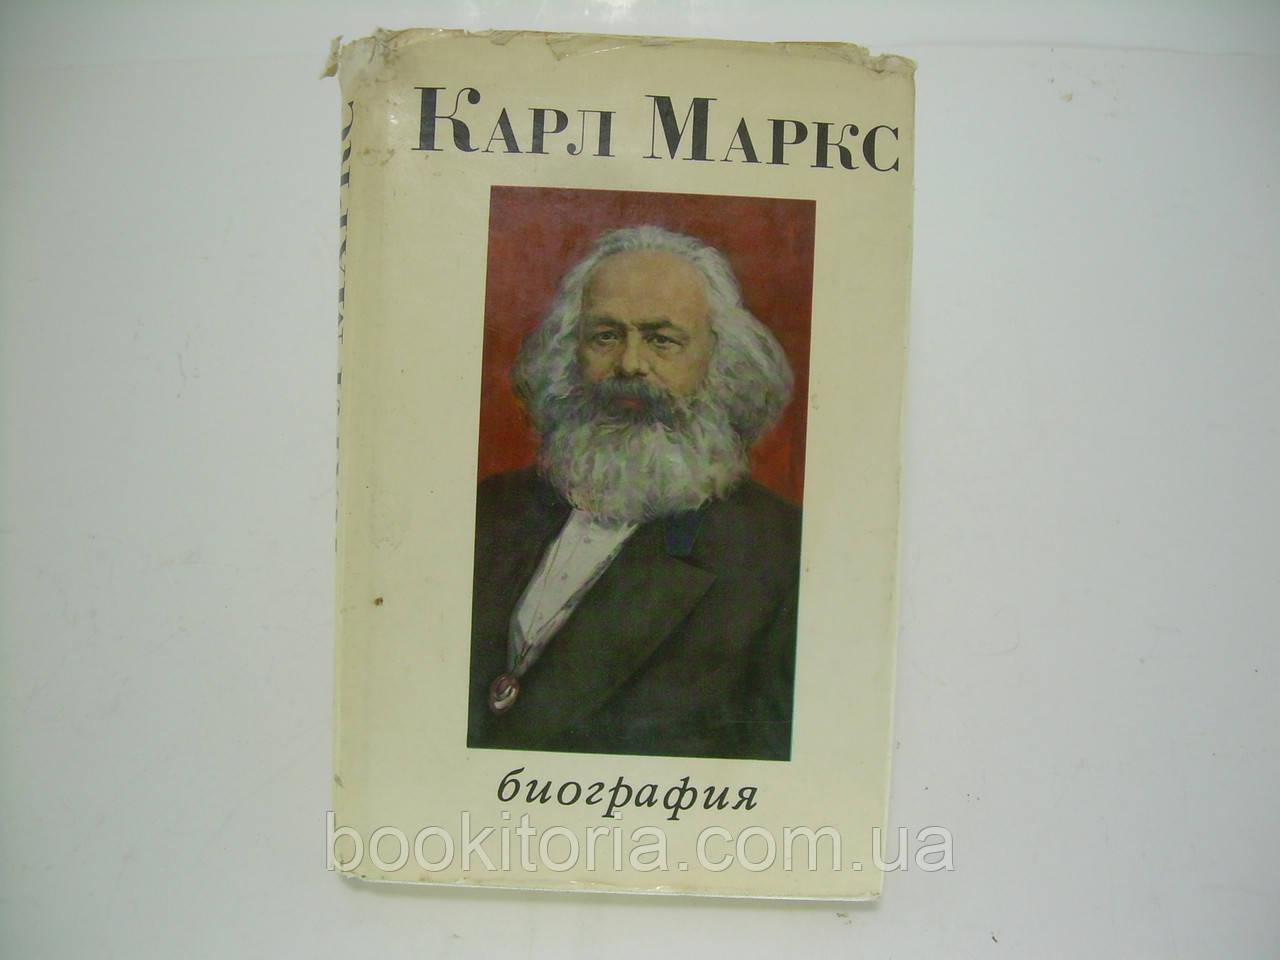 Карл Маркс. Биография (б/у).